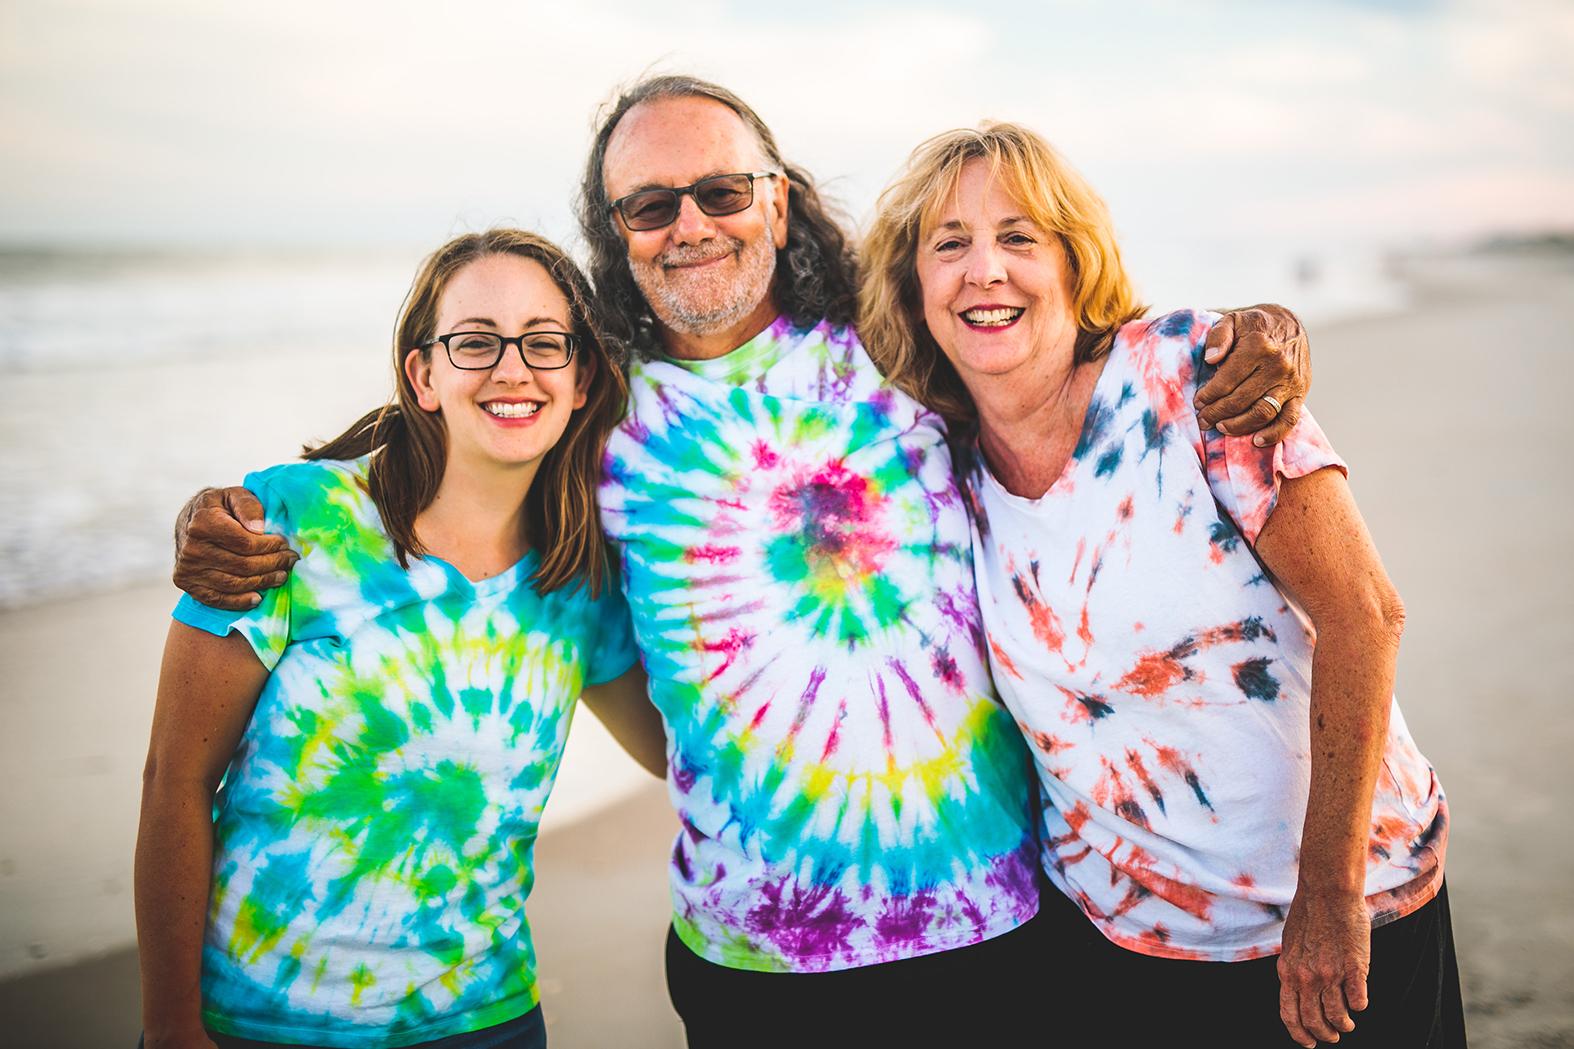 Family fun beach photos.jpg